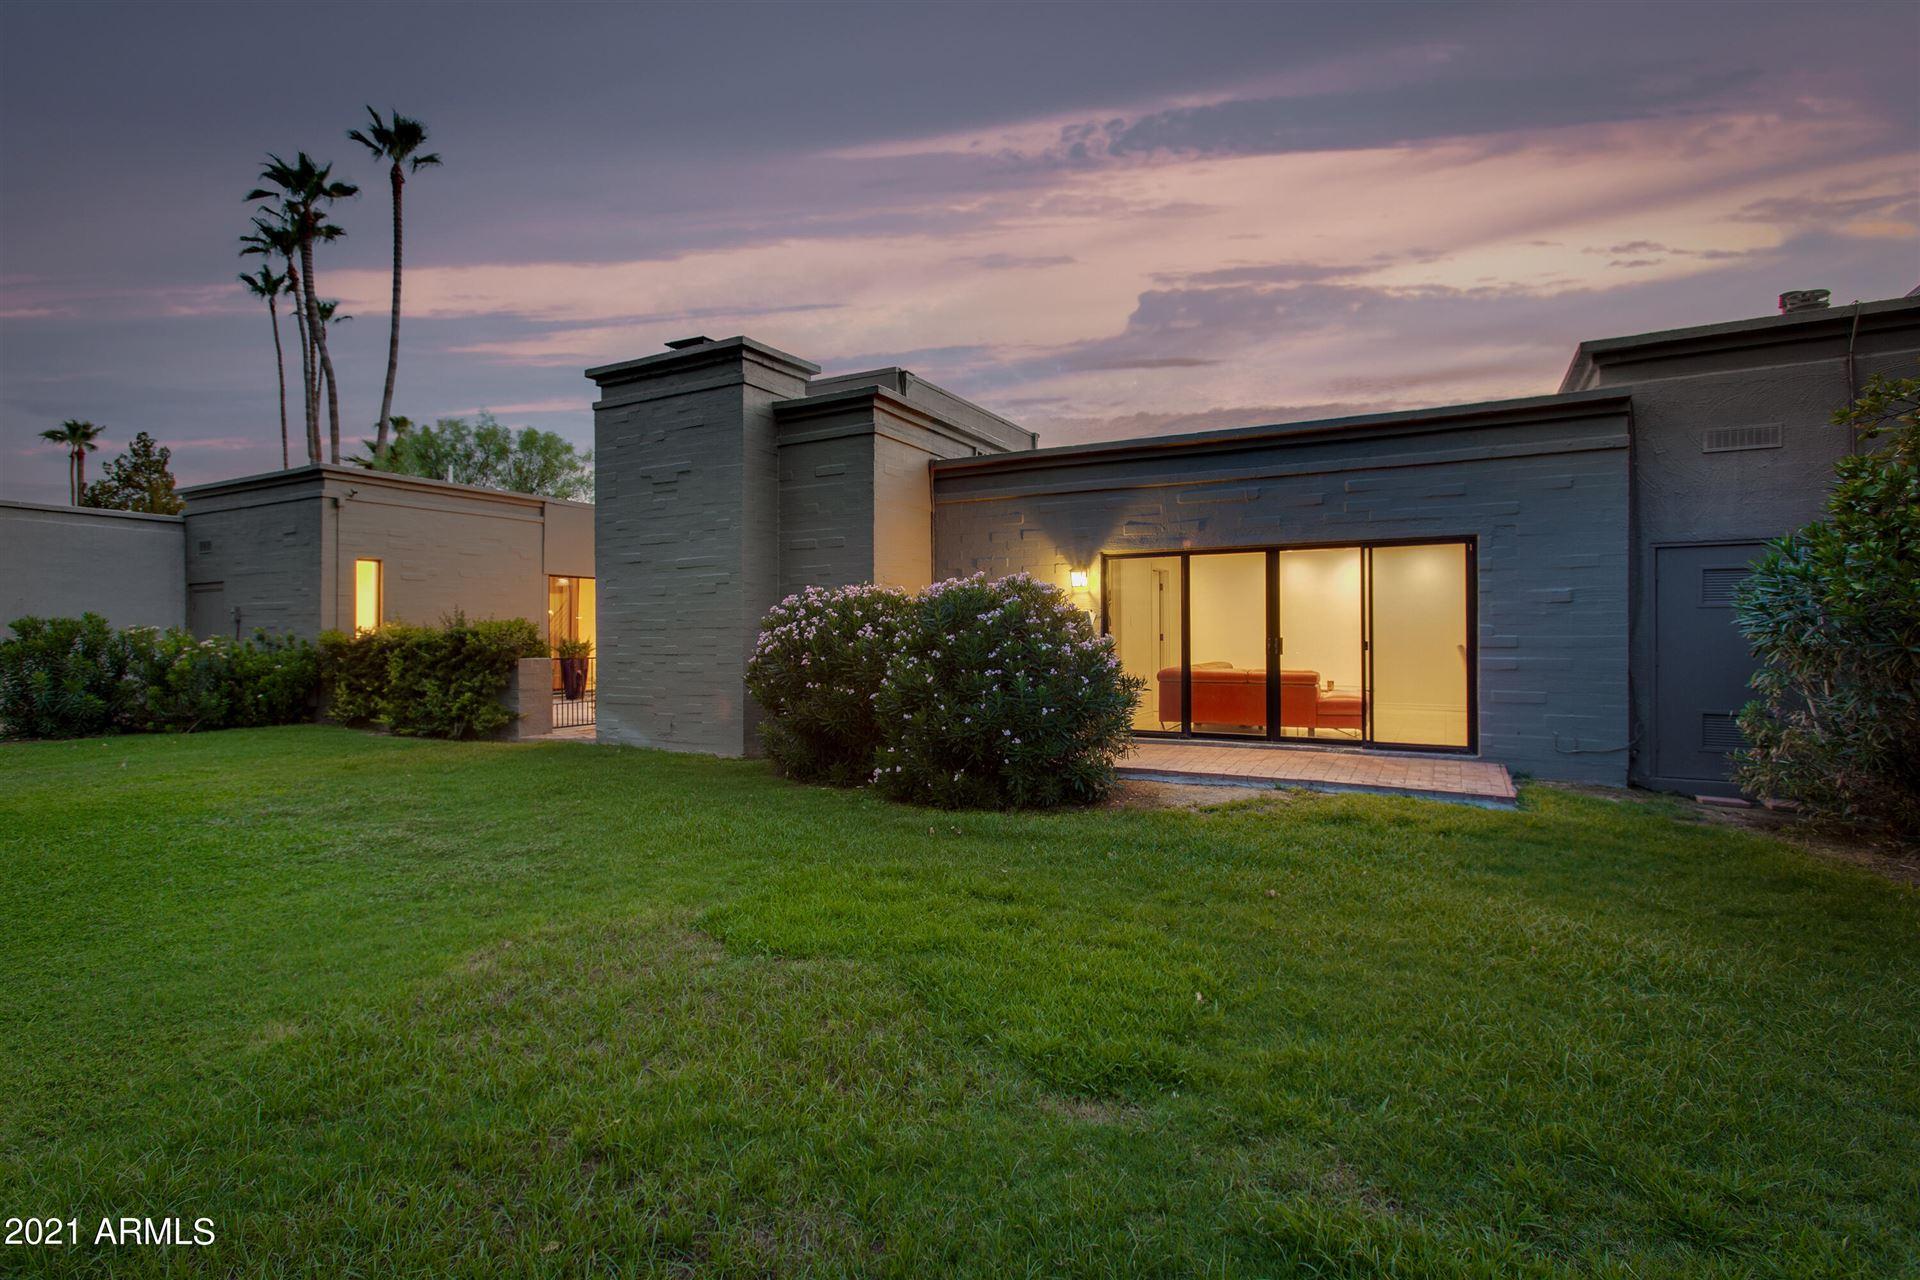 Photo of 5646 N Scottsdale Road, Paradise Valley, AZ 85253 (MLS # 6269355)